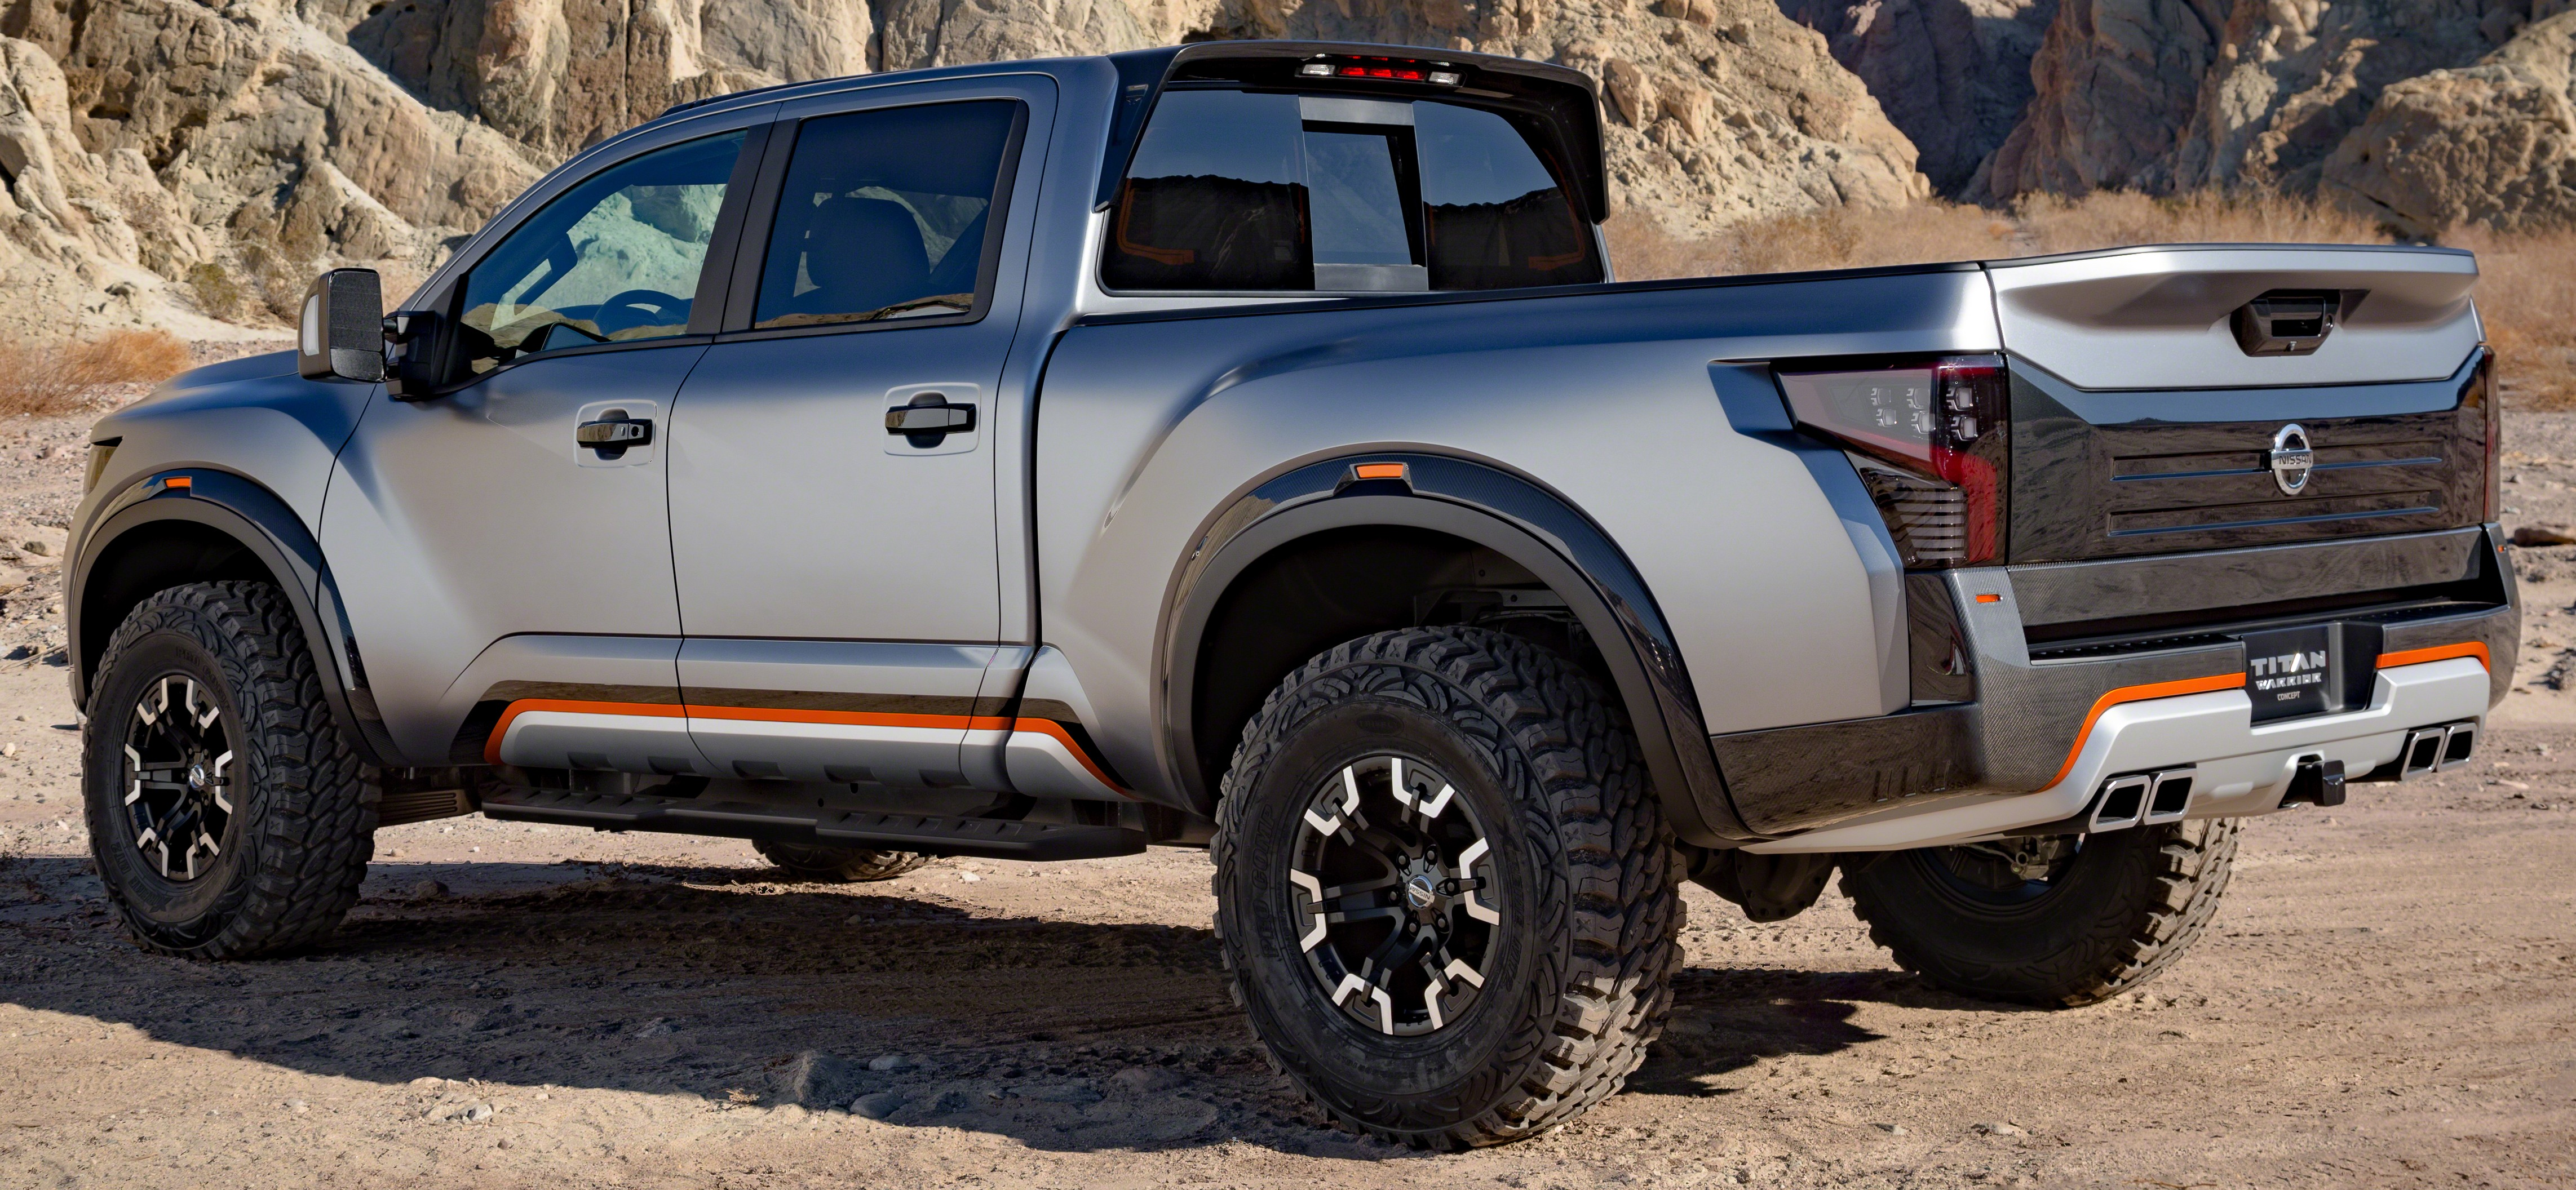 Nissan Titan Warrior Concept makes debut in Detroit Paul ...